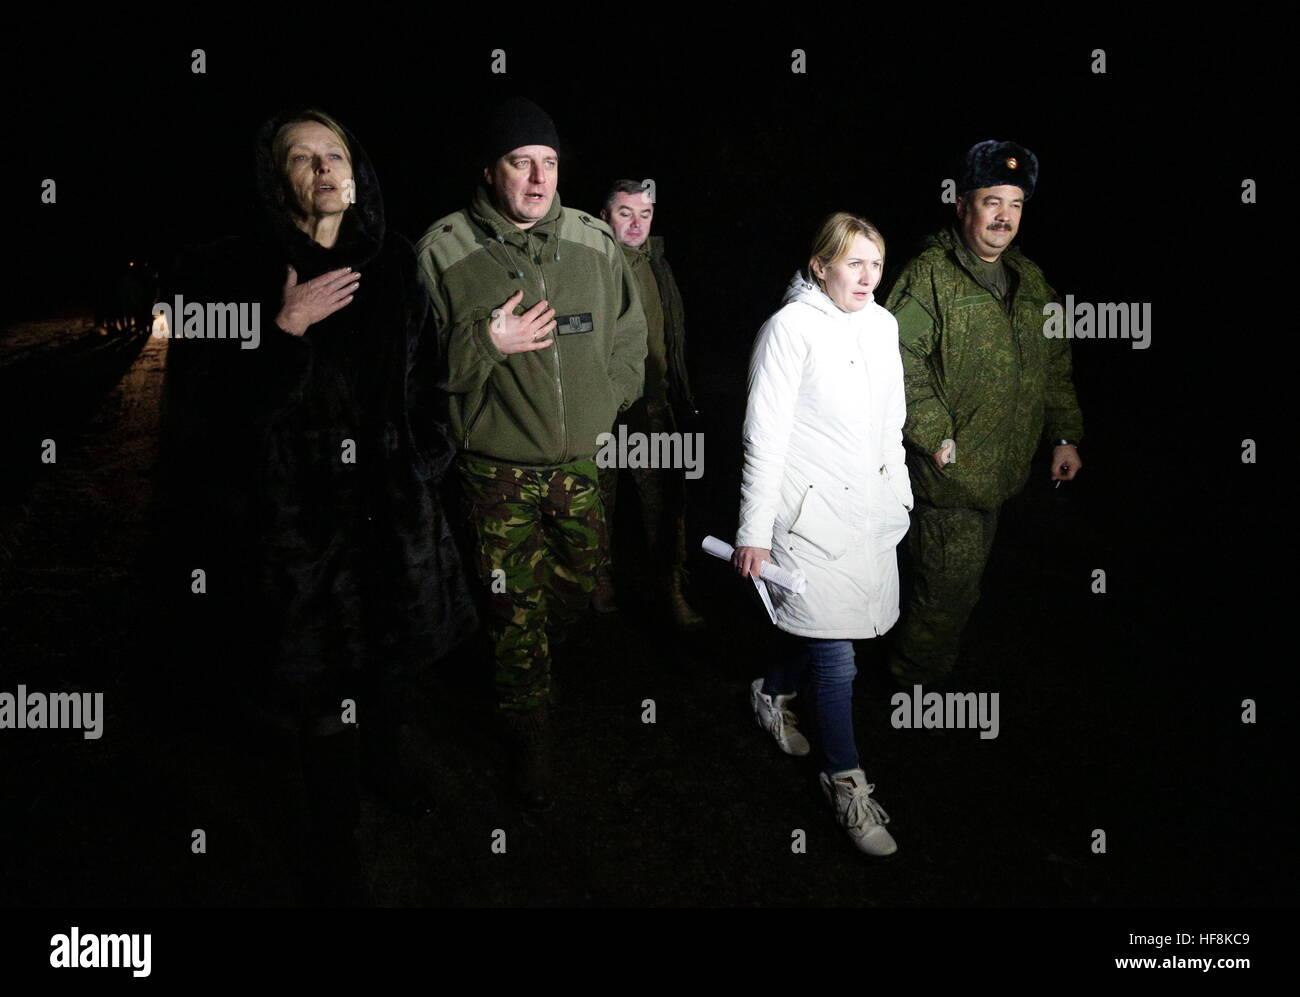 HORLIVKA, UKRAINE - DECEMBER 29, 2016: The Ukrainian Government hands over 15 war prisoners, 8 men and 7 women, Stock Photo